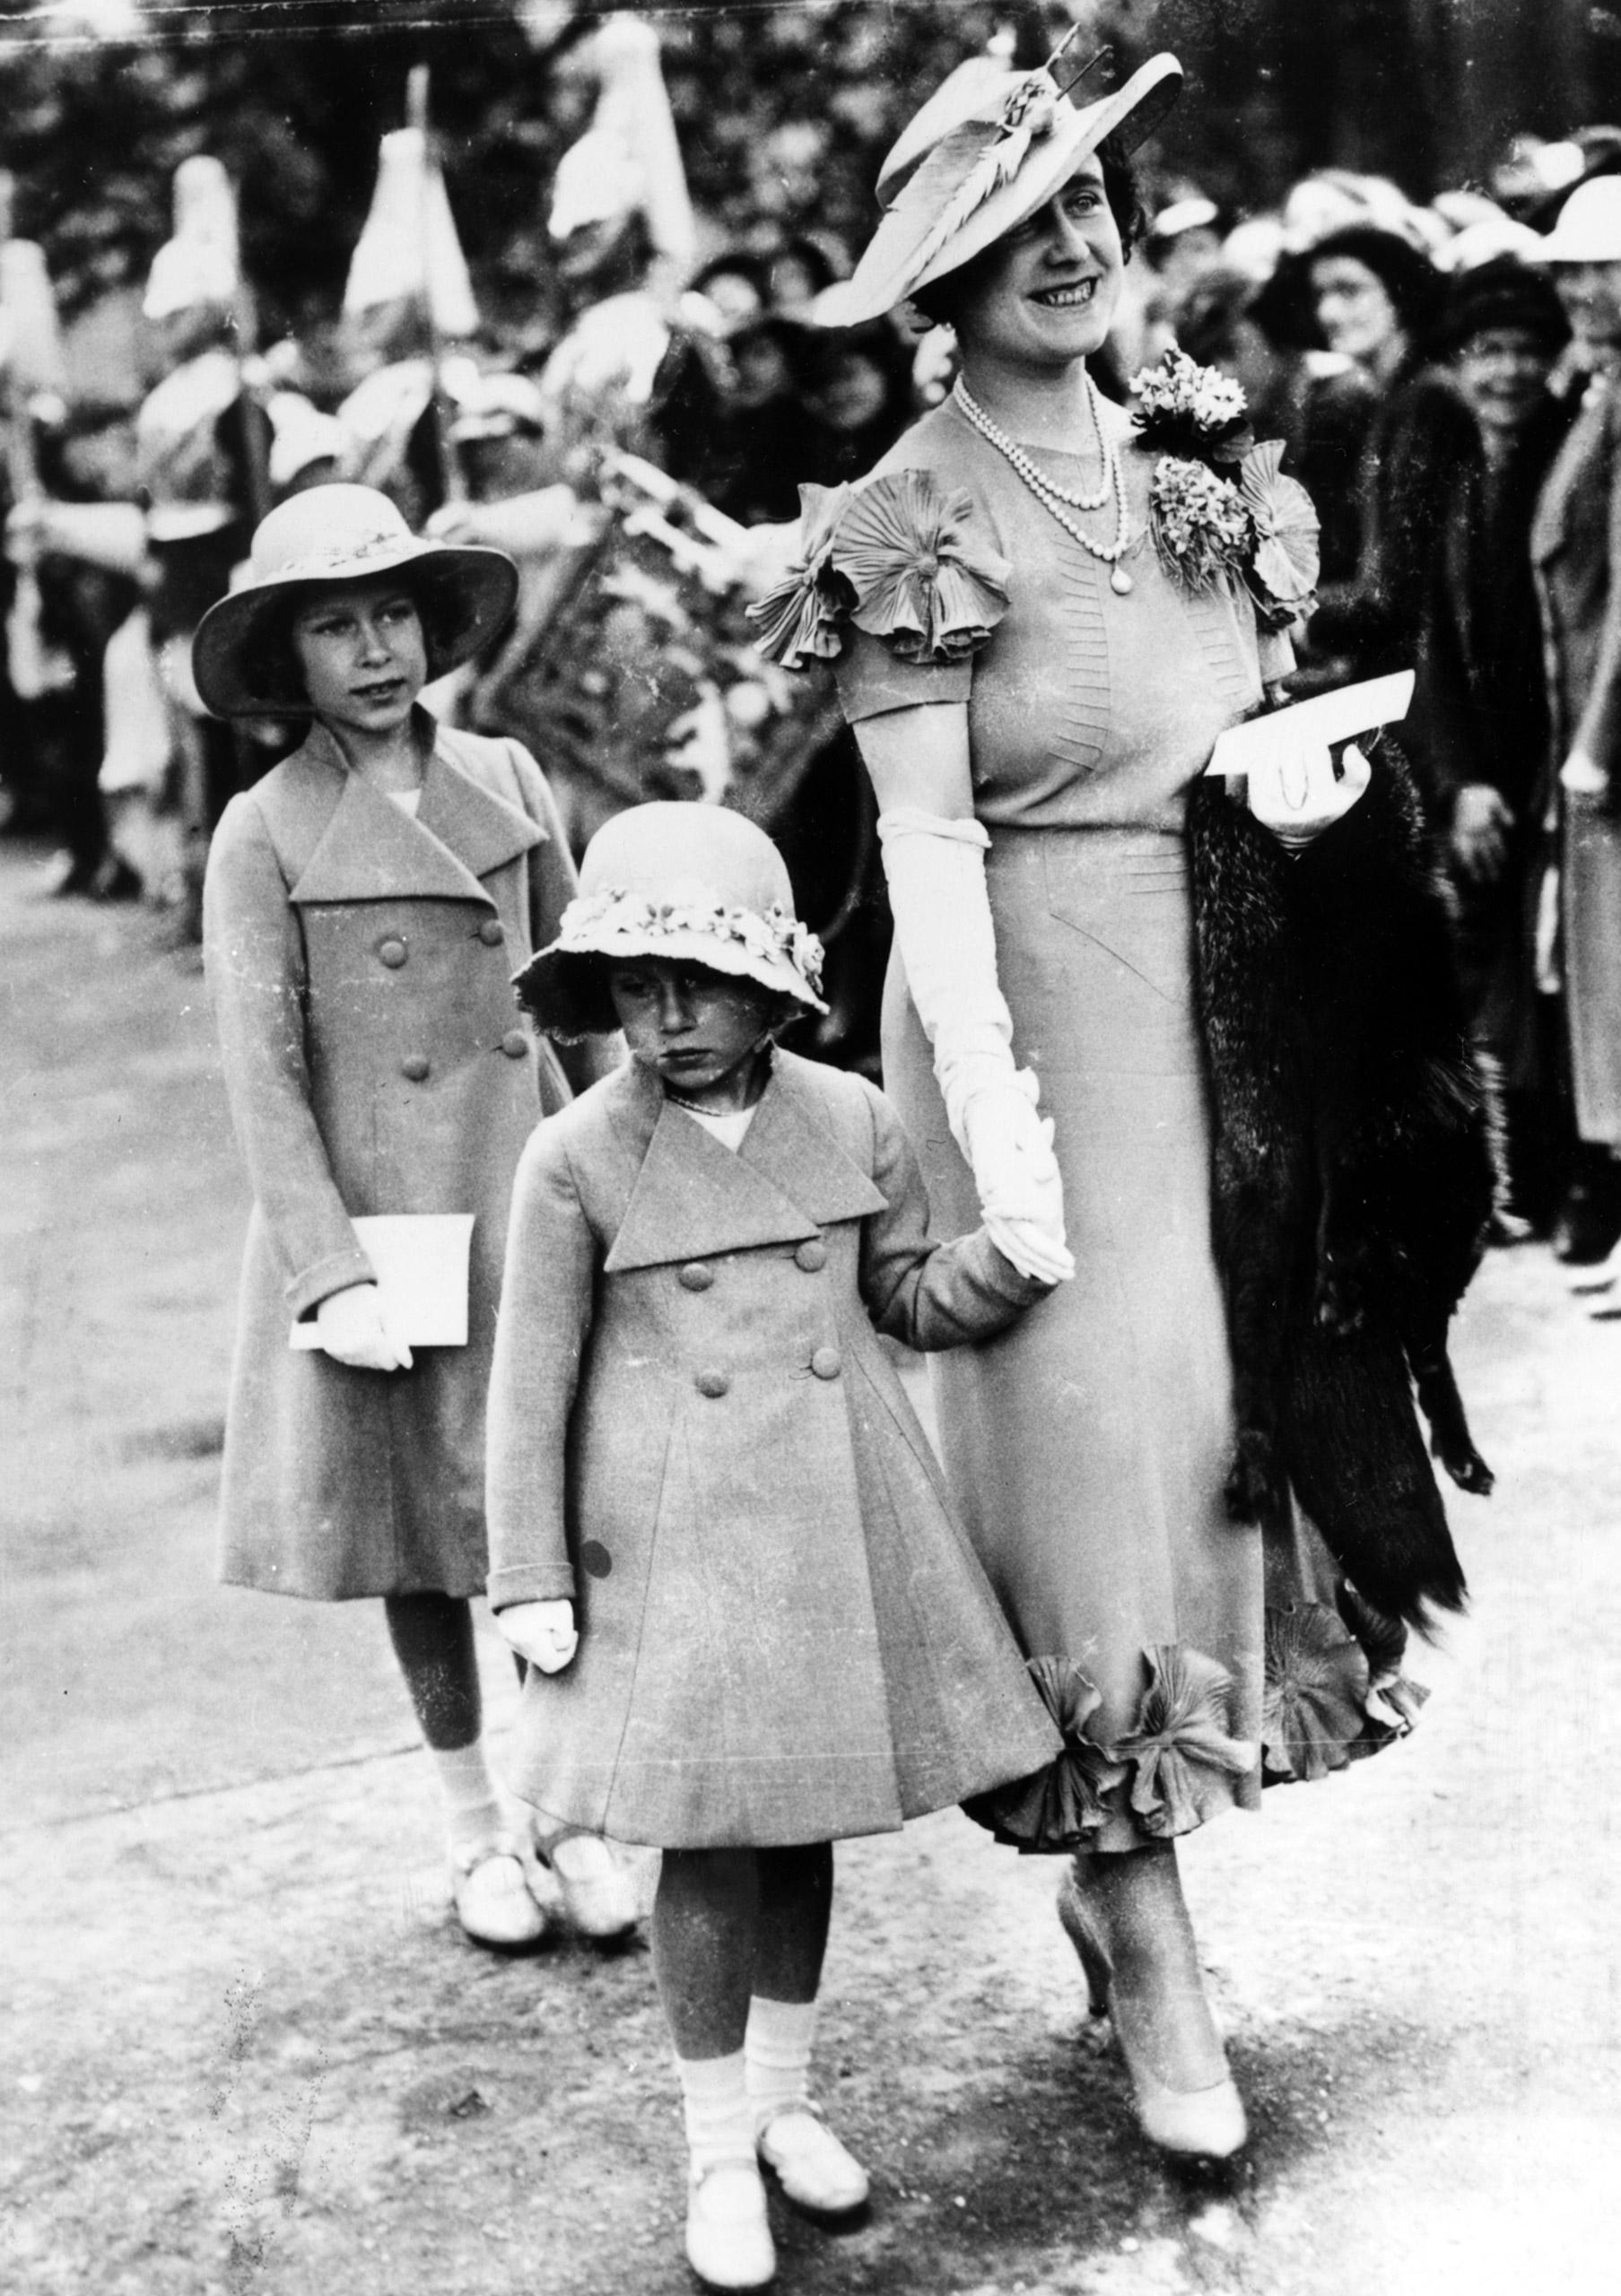 Queen consort Elizabeth holding Princess Margaret's hand as Princess Elizabeth follows, attending the Elphinstone wedding, 1936.